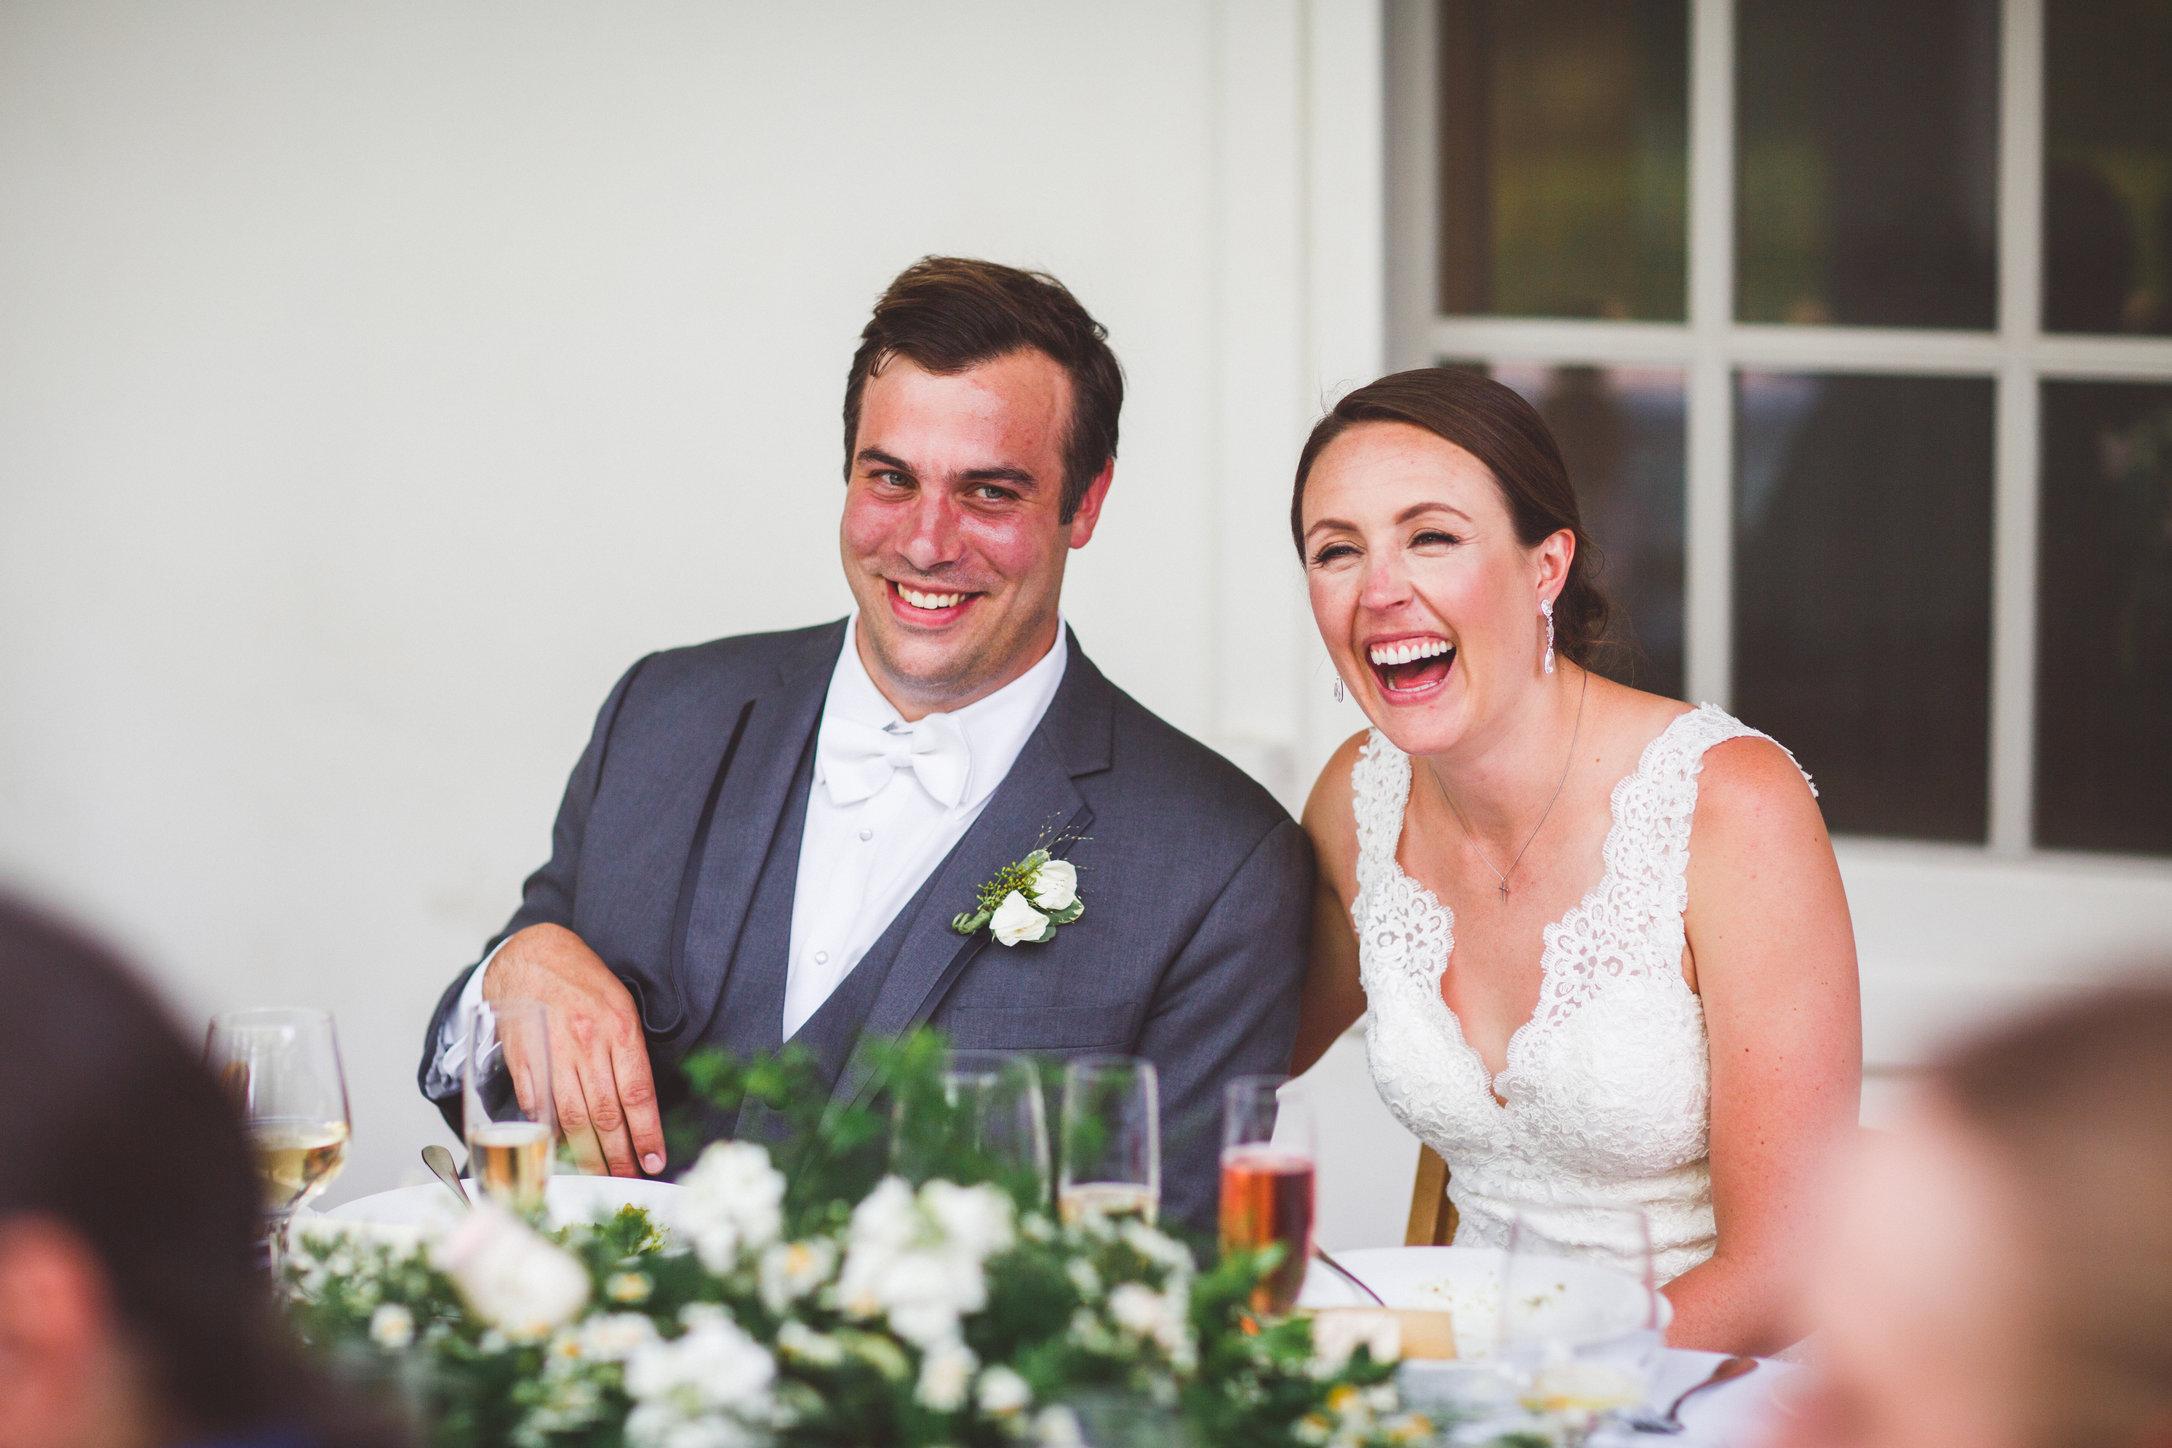 SandC-wedding-495.jpg